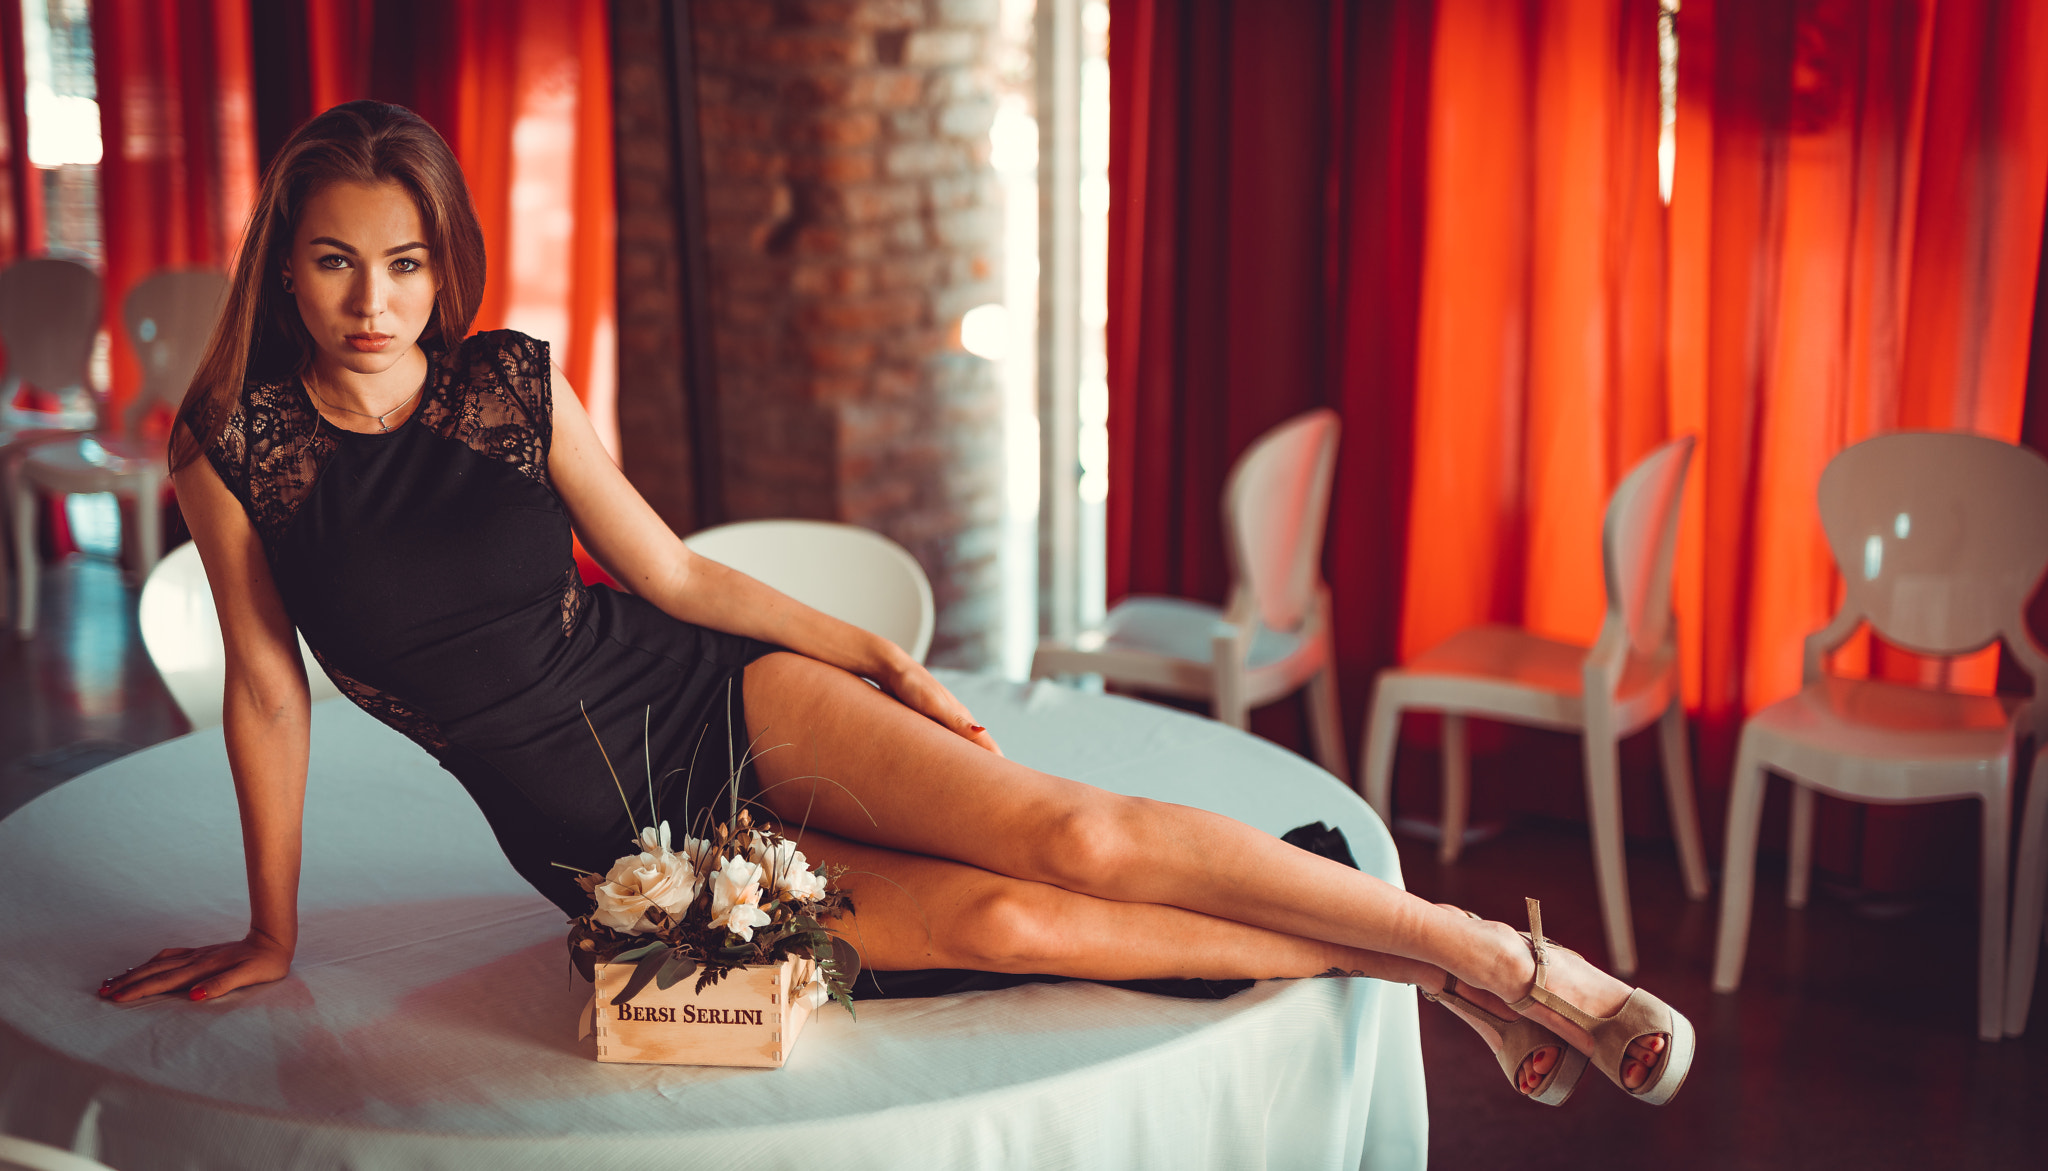 People 2048x1171 women Marco Squassina black dress high heels table red nails portrait women indoors high cut dress brunette lying on side long hair